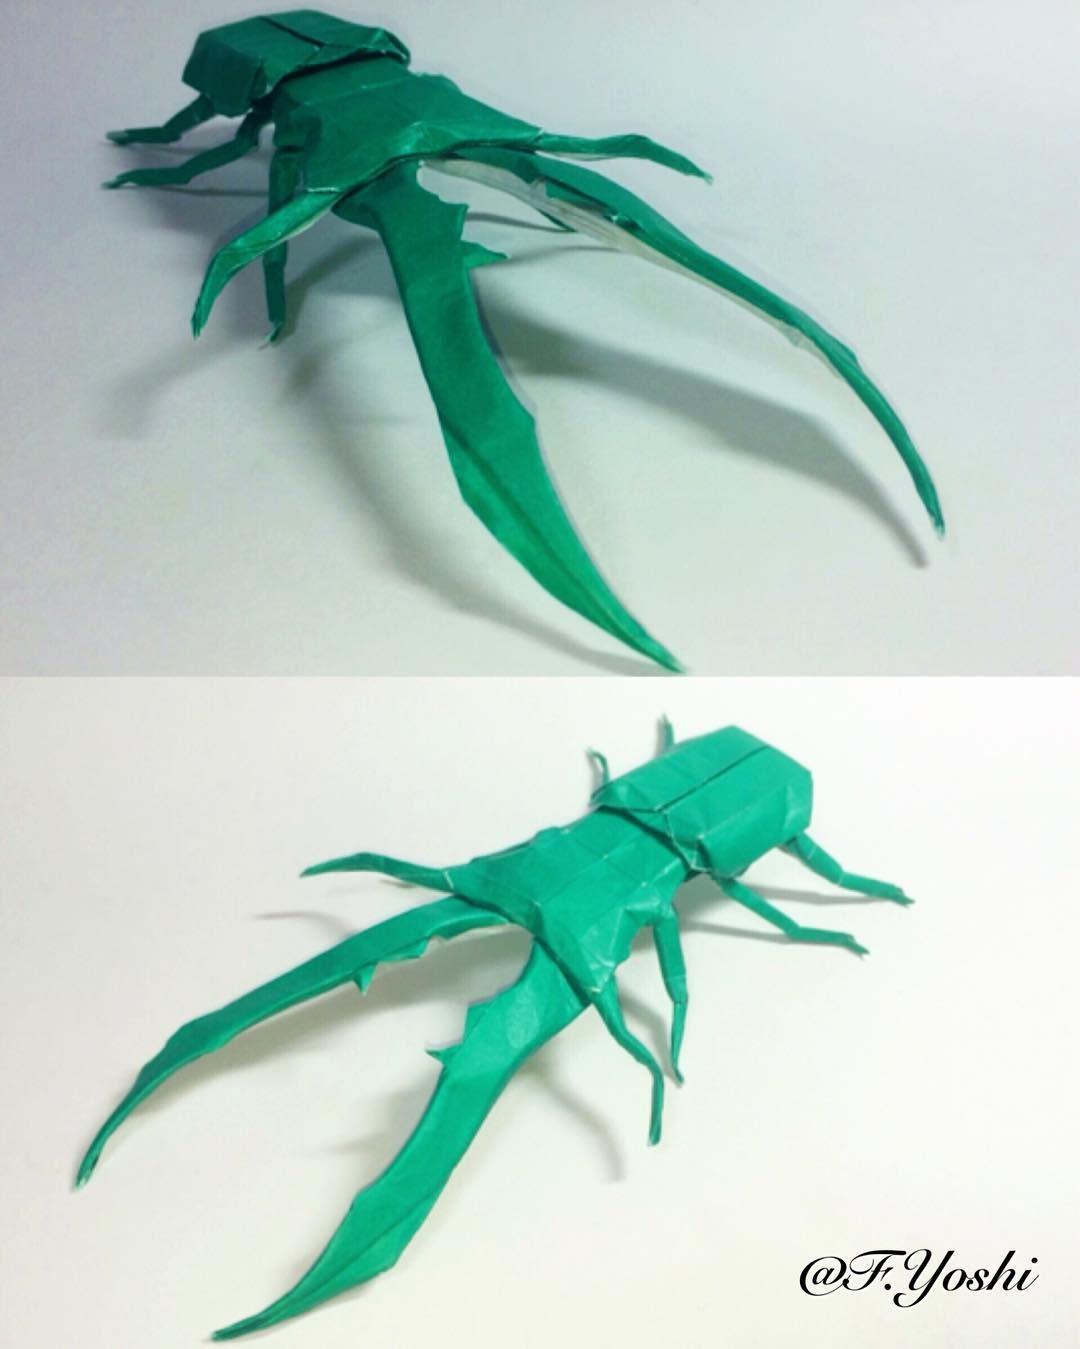 Titlecyclommatus Metallifer Design Video Diagram Origami Quotswan Quyetquot Designsatoshi Kamiya 40x40cm Paper Papercraft Insect